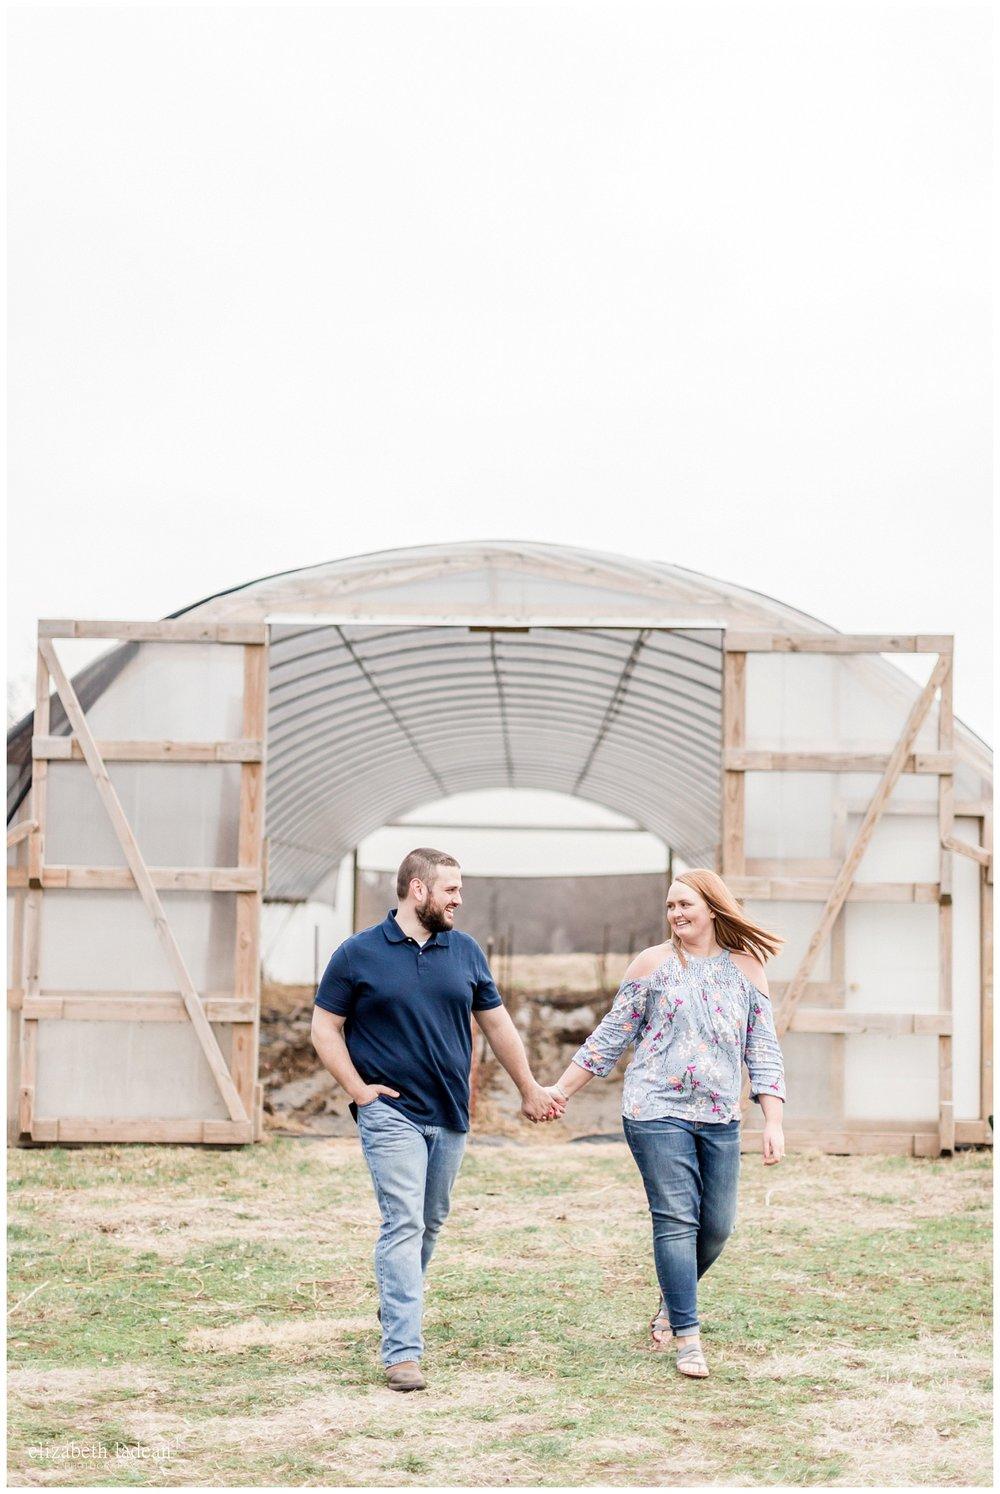 Weston-Red-Barn-Farm-engagement-session-L+A2018-elizabeth-ladean-photography-photo-_6528.jpg